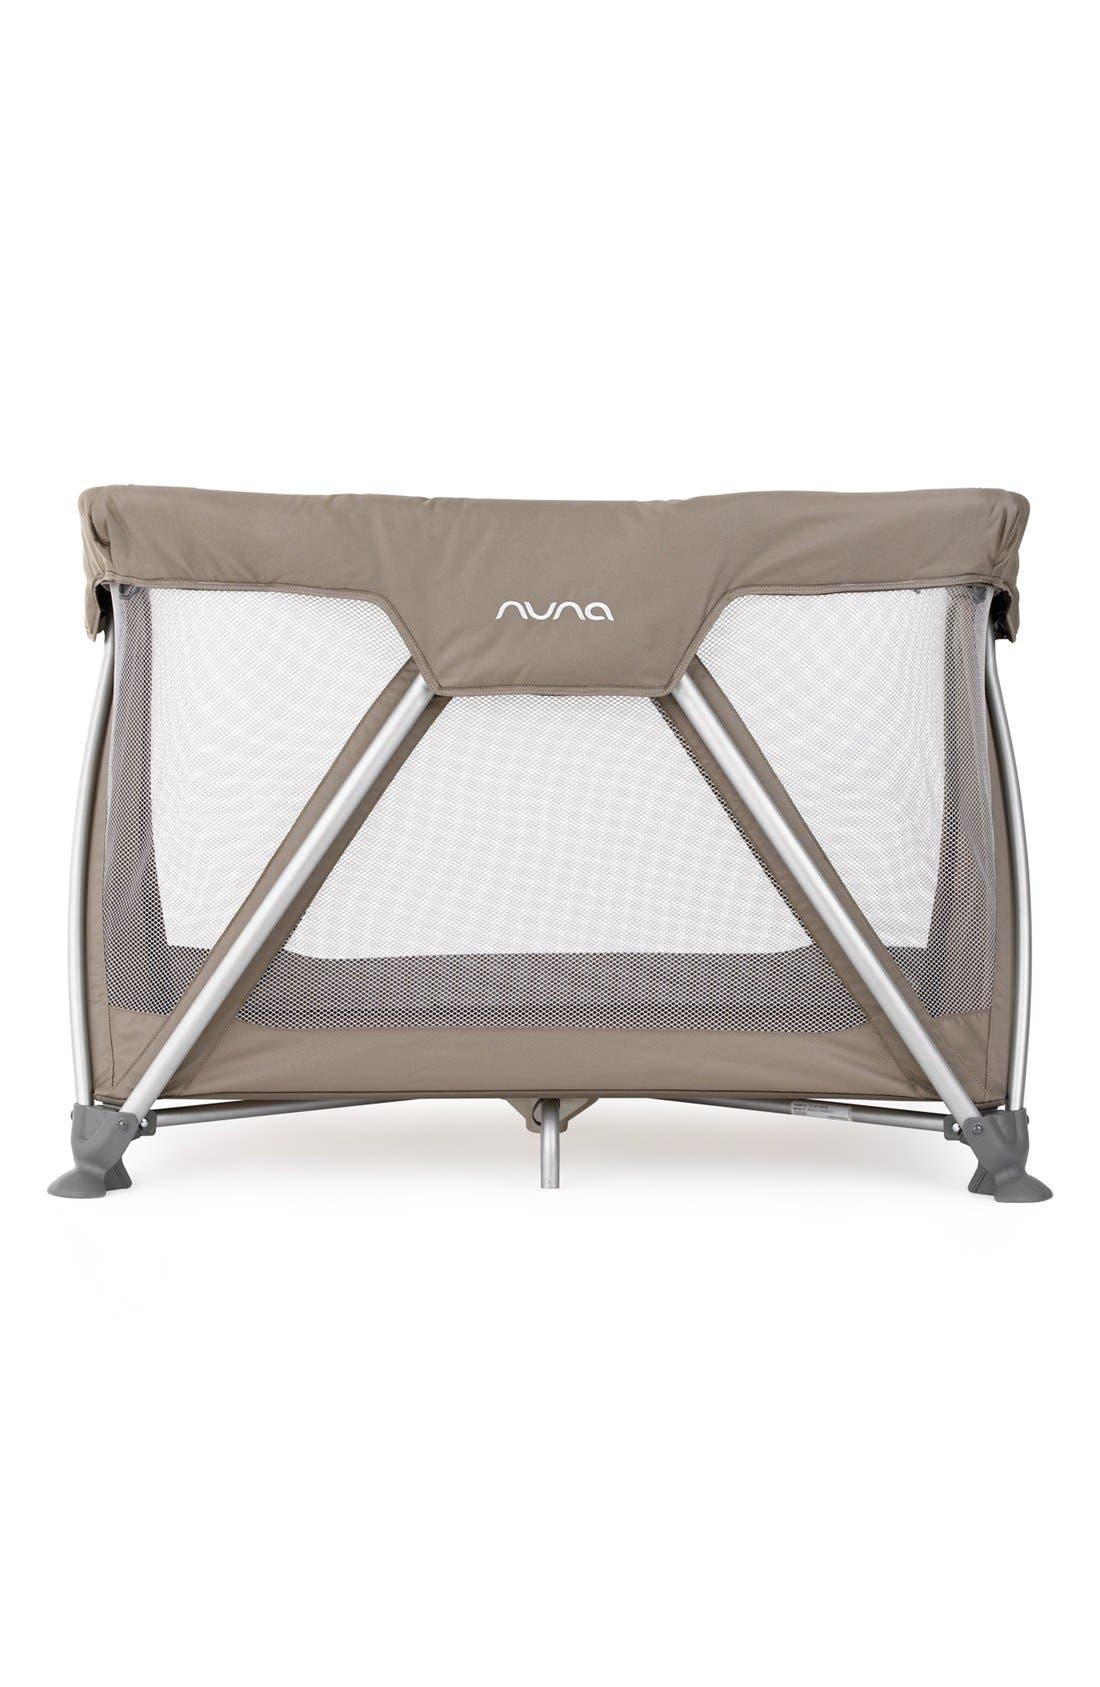 Alternate Image 1 Selected - nuna 'SENA™' Travel Crib (Online Only)